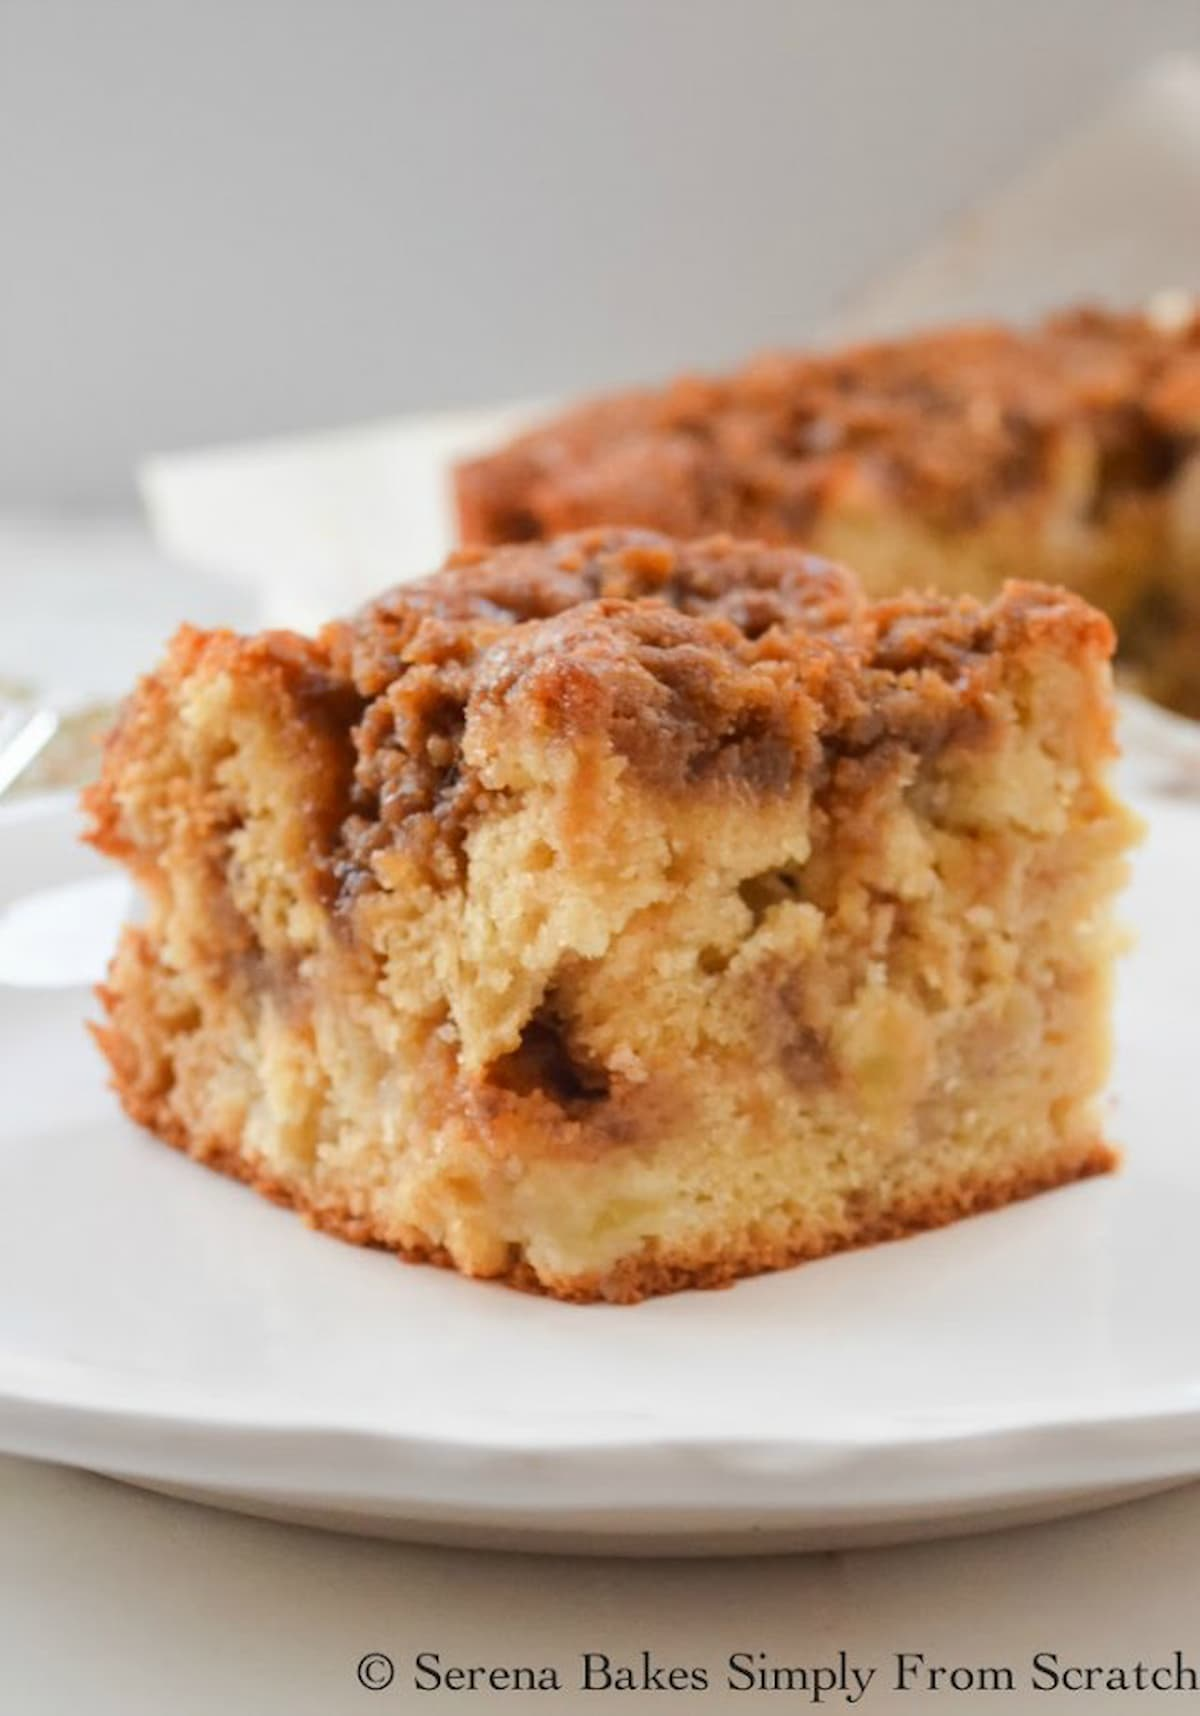 Apple Coffee Cake with Cinnamon Brown Sugar Crumb